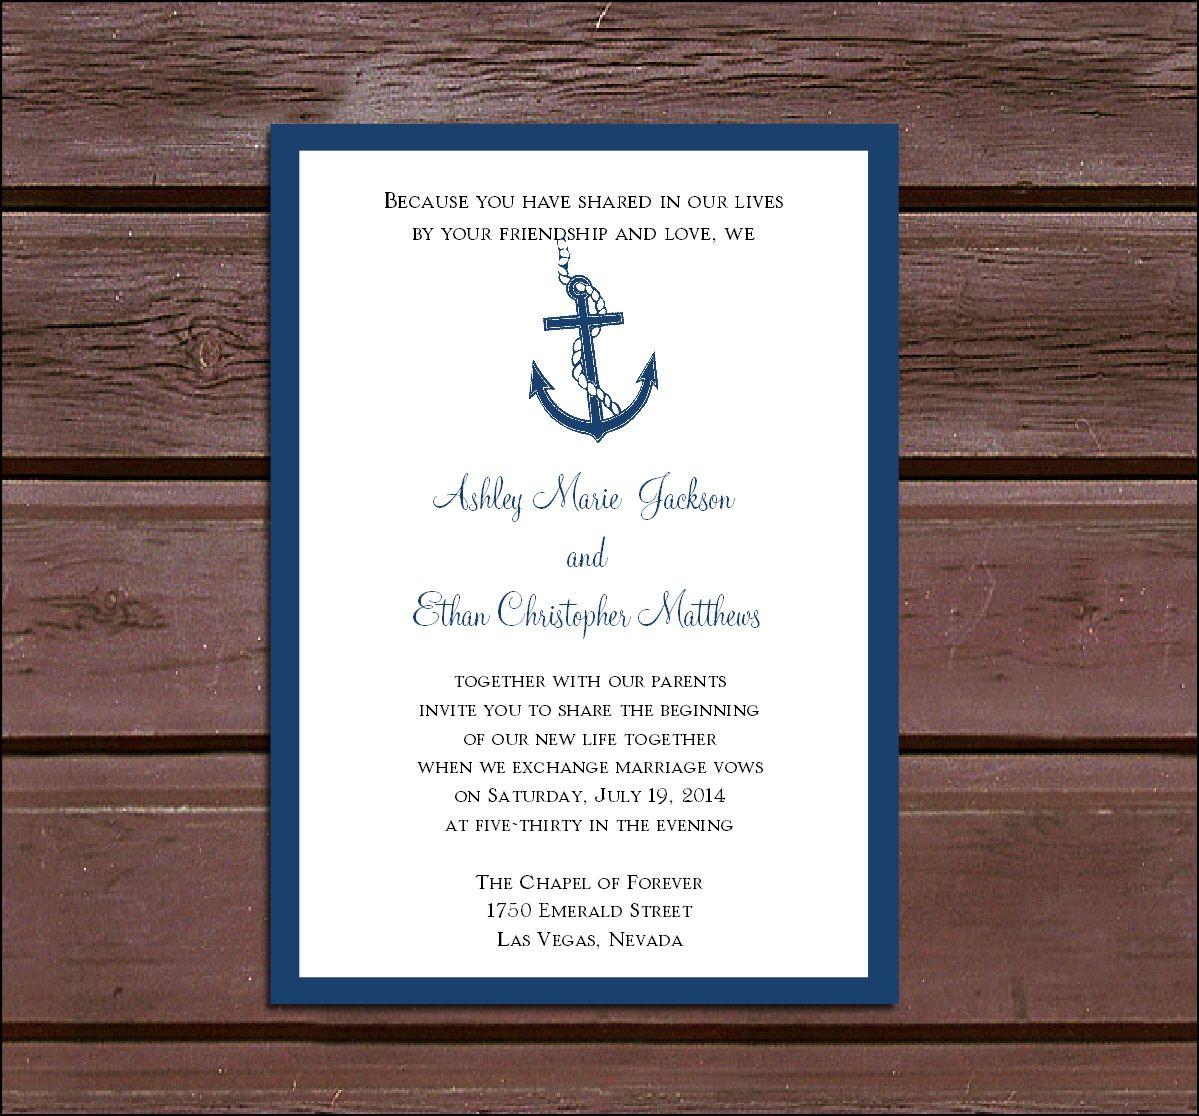 Nautical Wedding Invitation Template | Wedding invitations ...